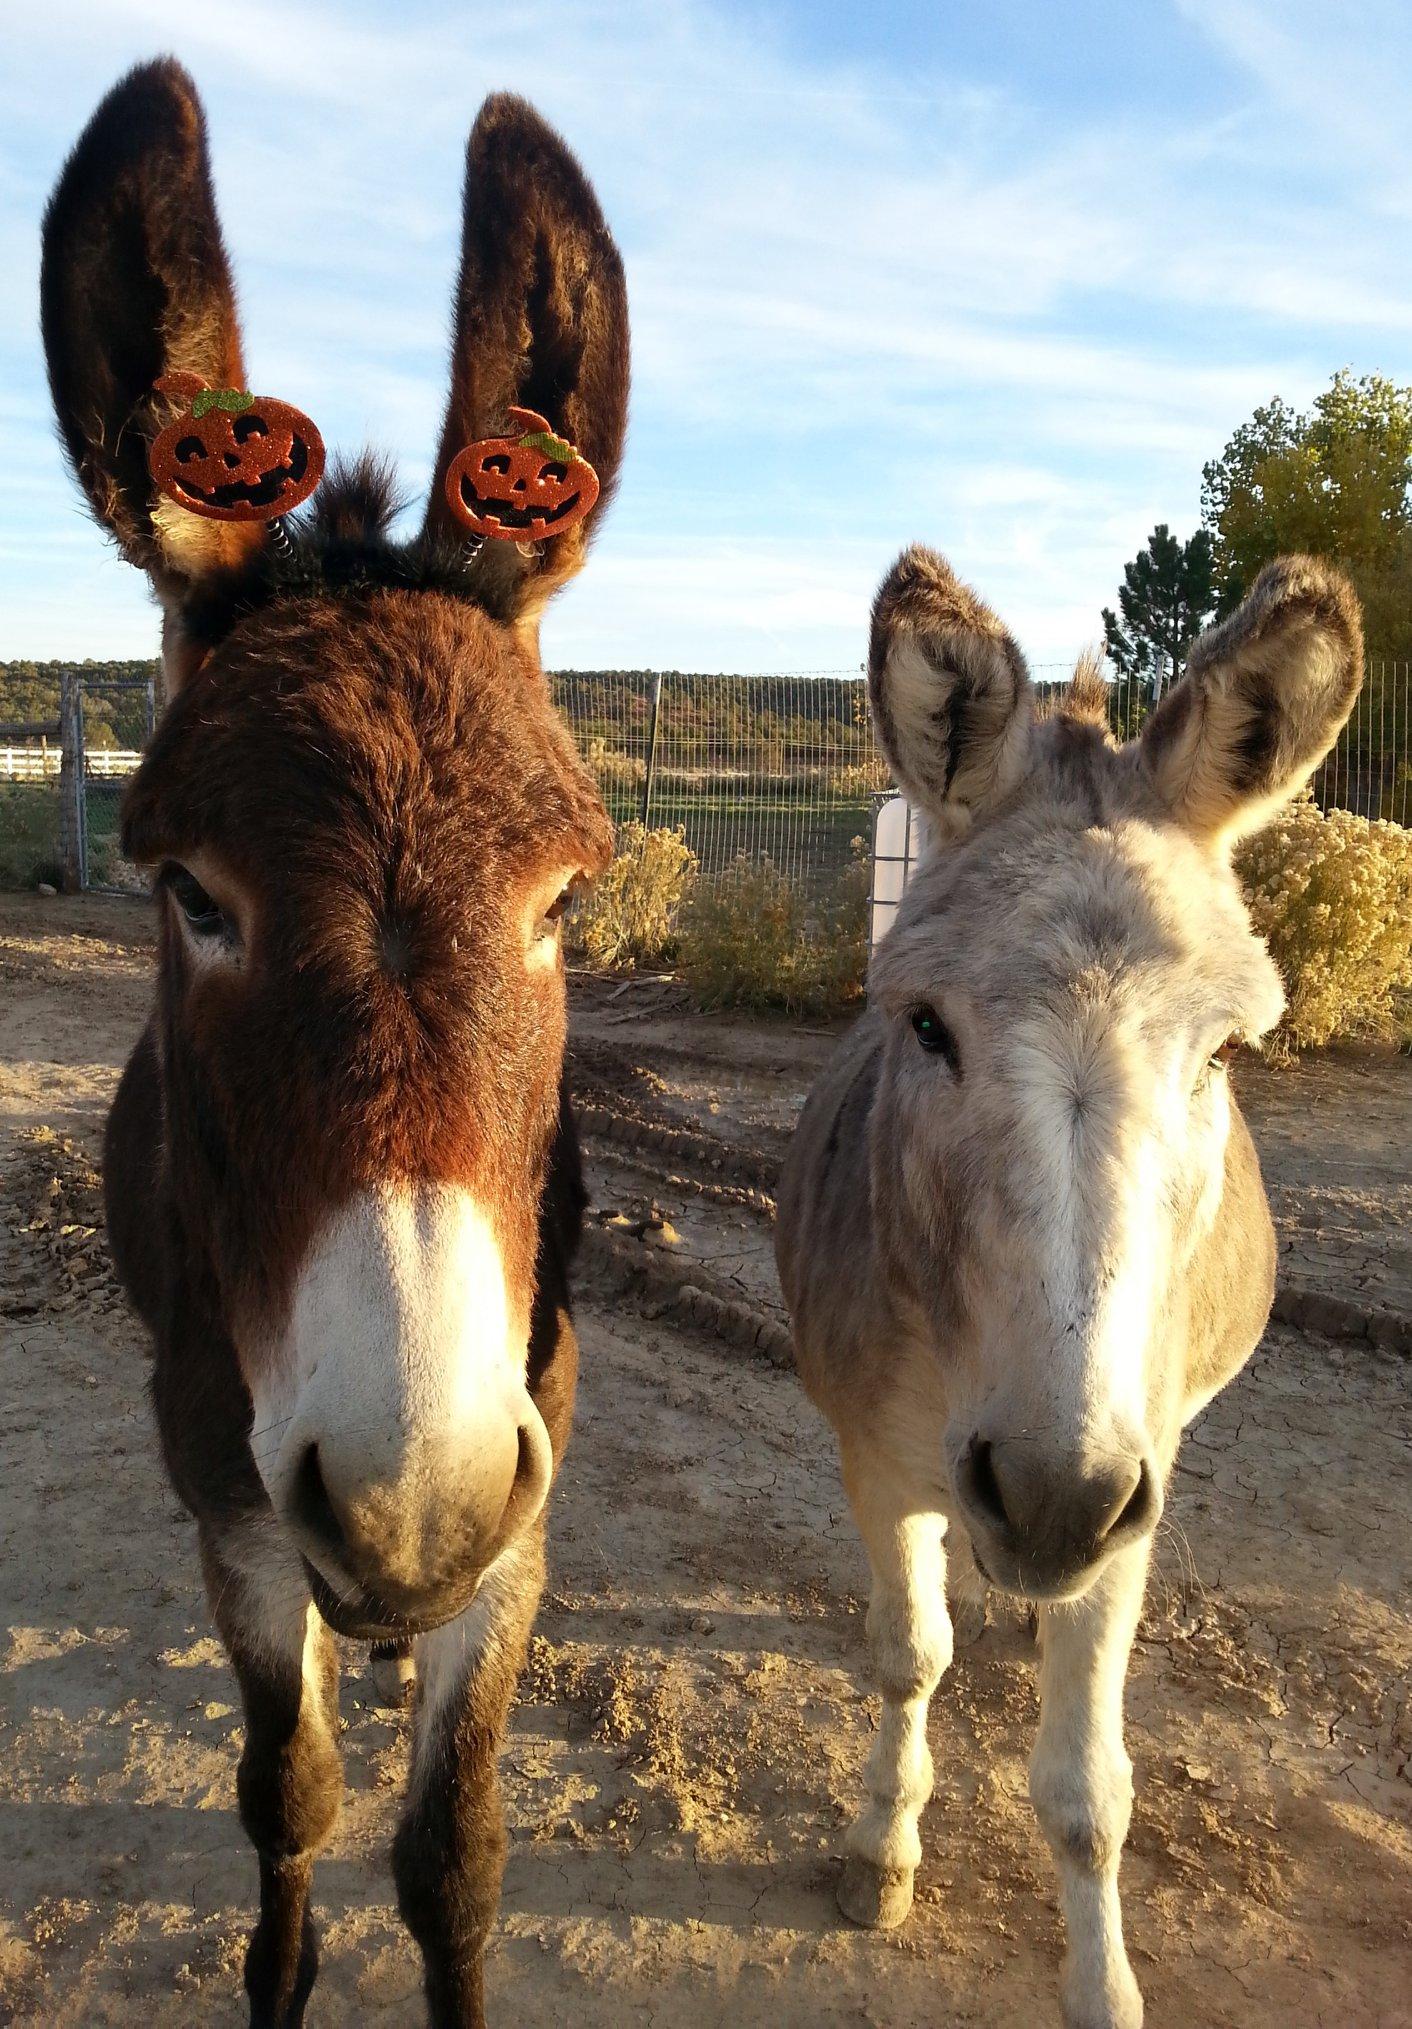 Rescue Donkeys - Otis and Milo